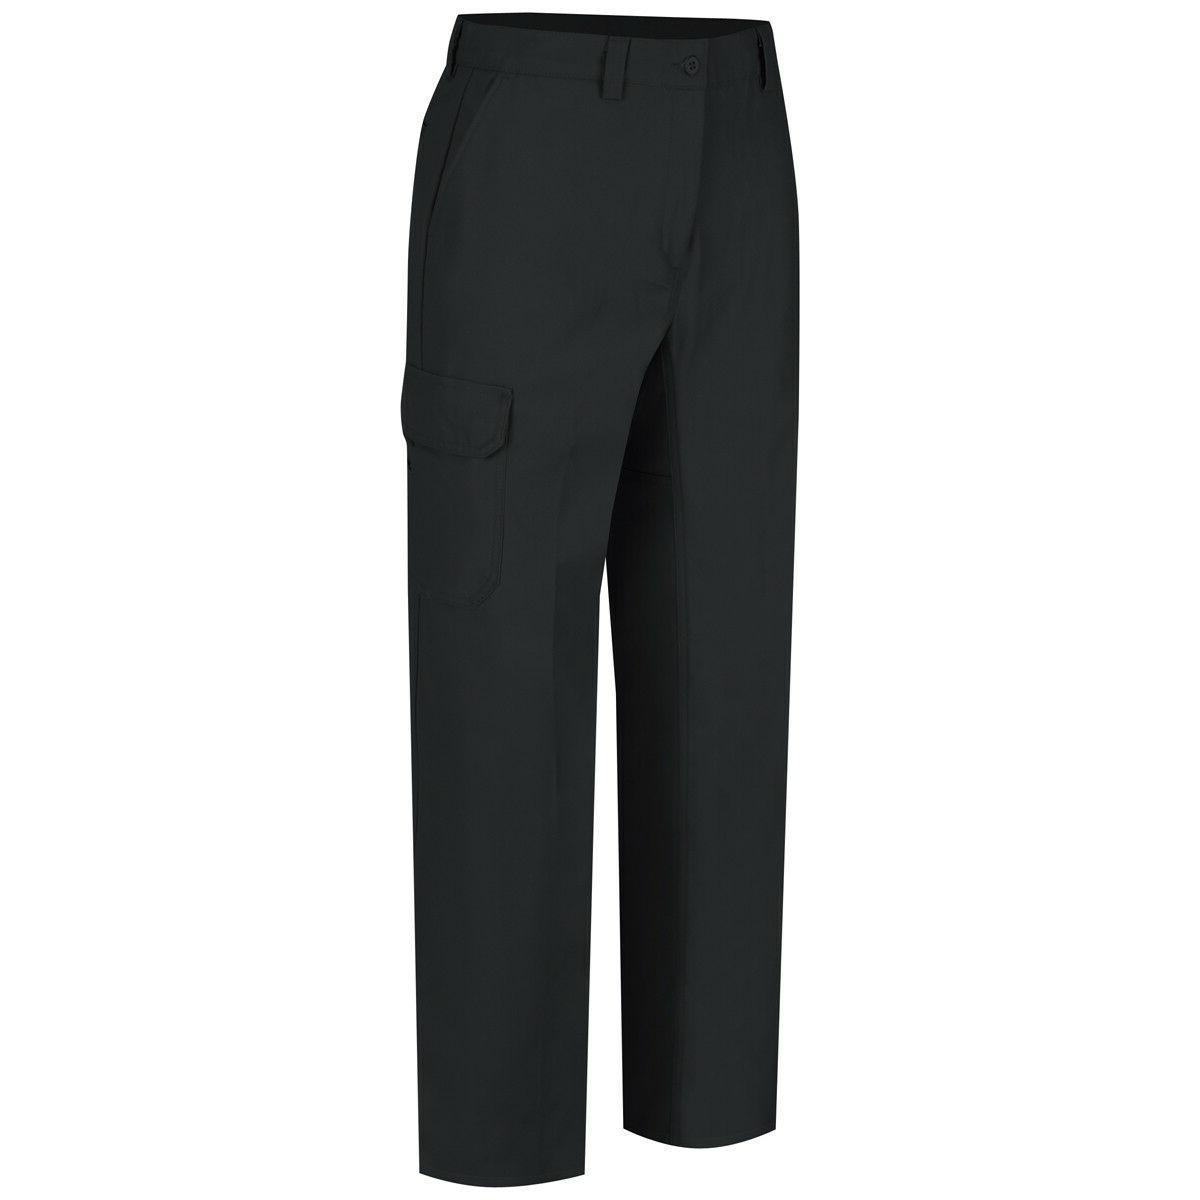 Wrangler Mens Functional Cargo Work Pants, Black